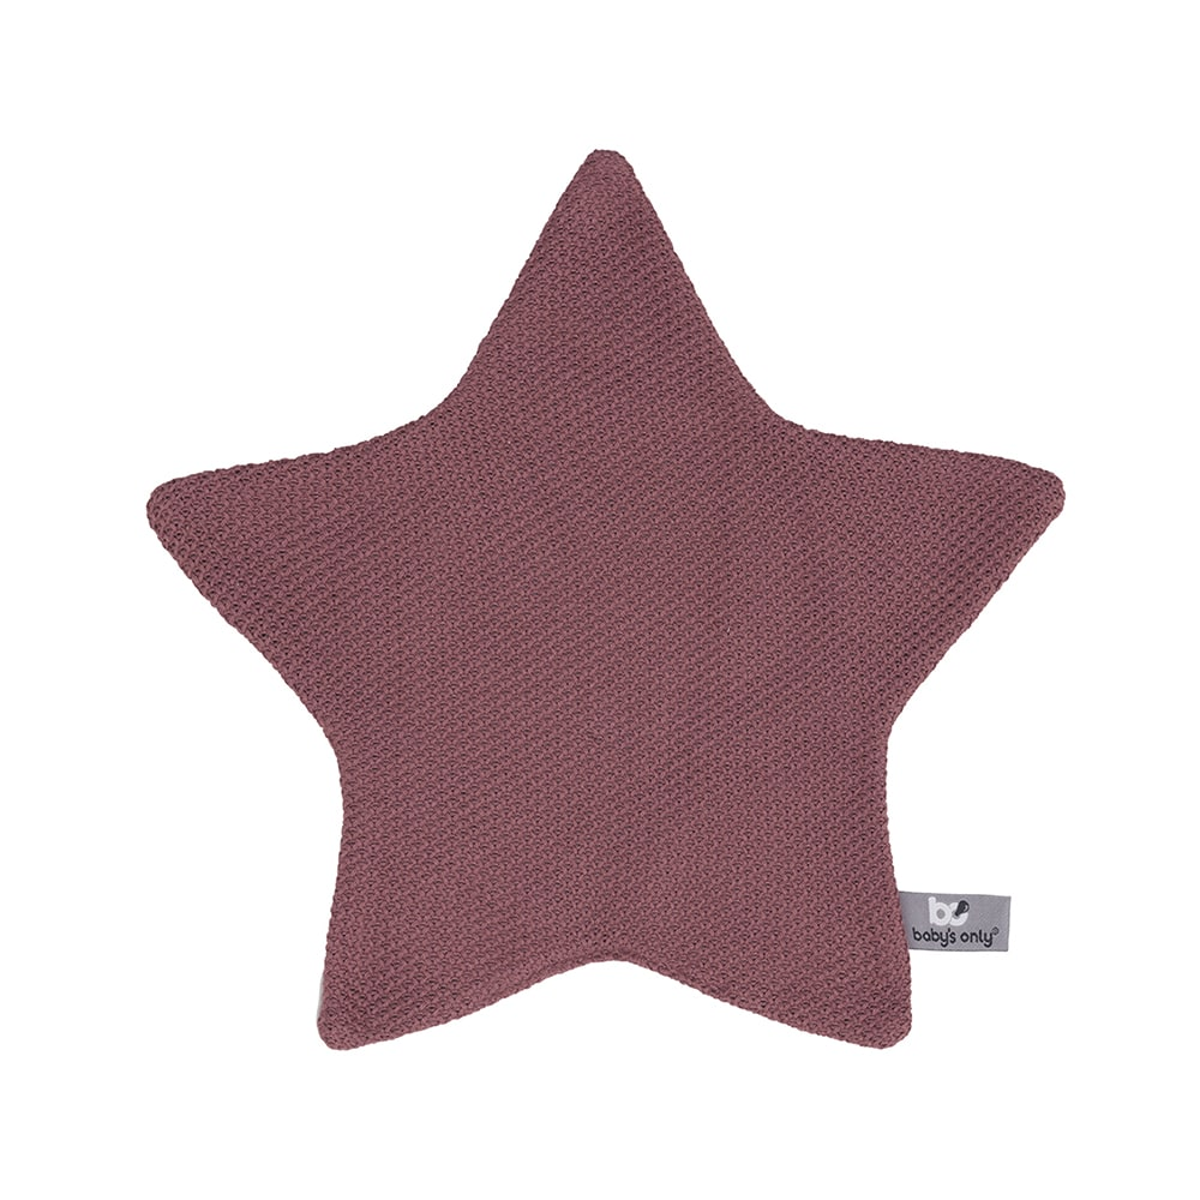 cuddle cloth star classic stone red